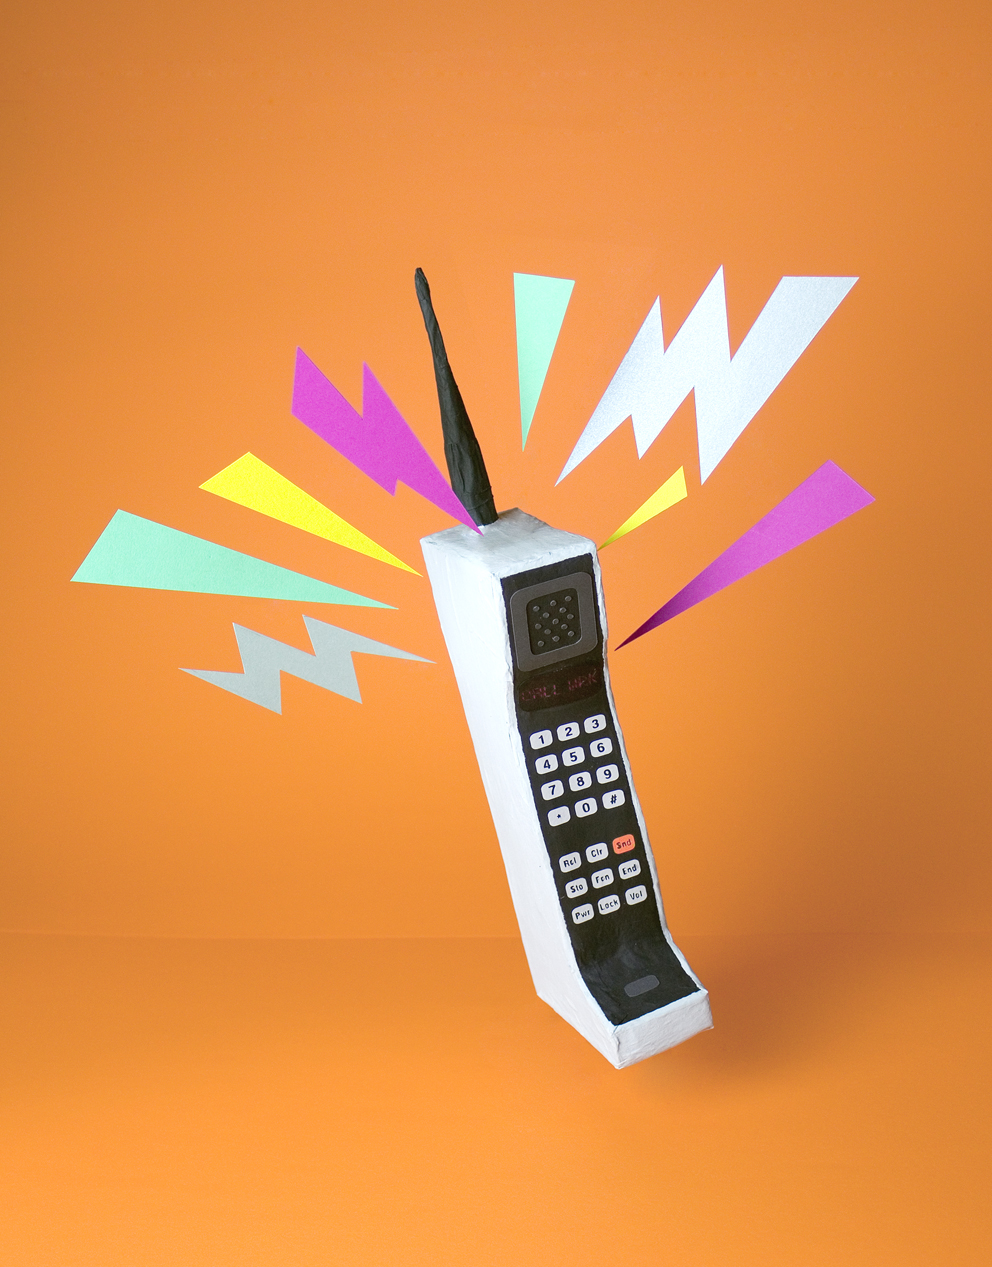 Motorola Dynatac 8000x Wrk Tactile Illustrations Paper Art